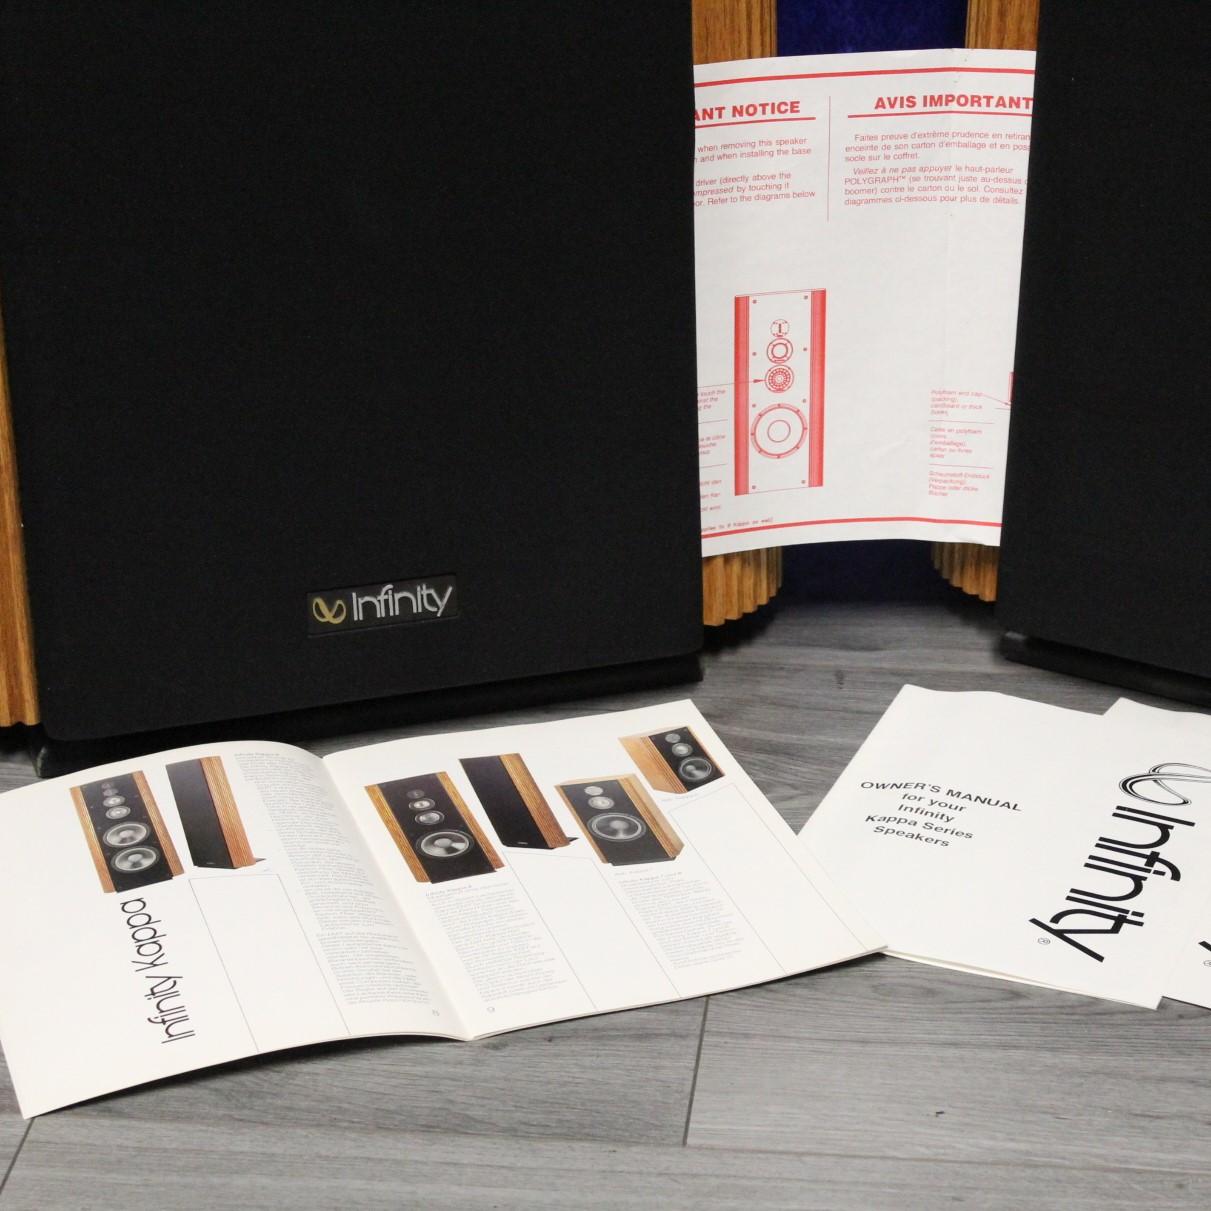 Infinity Kappa 8 Manuals